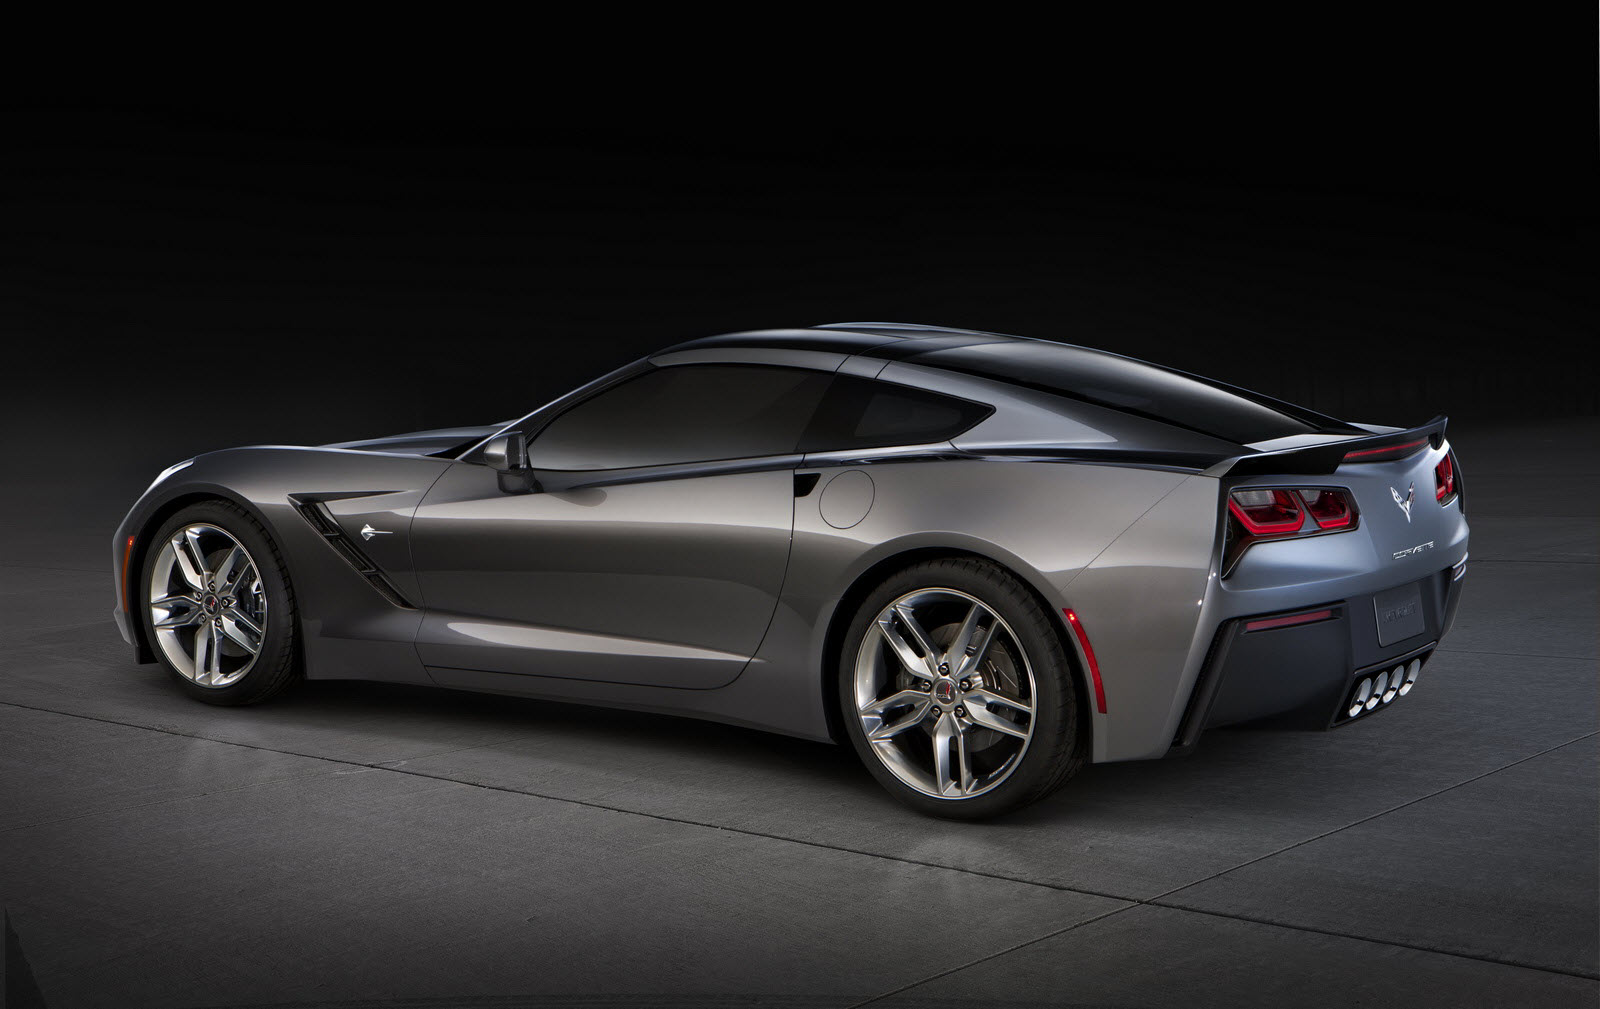 http://4.bp.blogspot.com/-w16TaogNNXw/UPPNx_4nYoI/AAAAAAABTp0/3R1c2O-ZCwE/s1600/2014_C-Corvette-Stingray_18.jpg